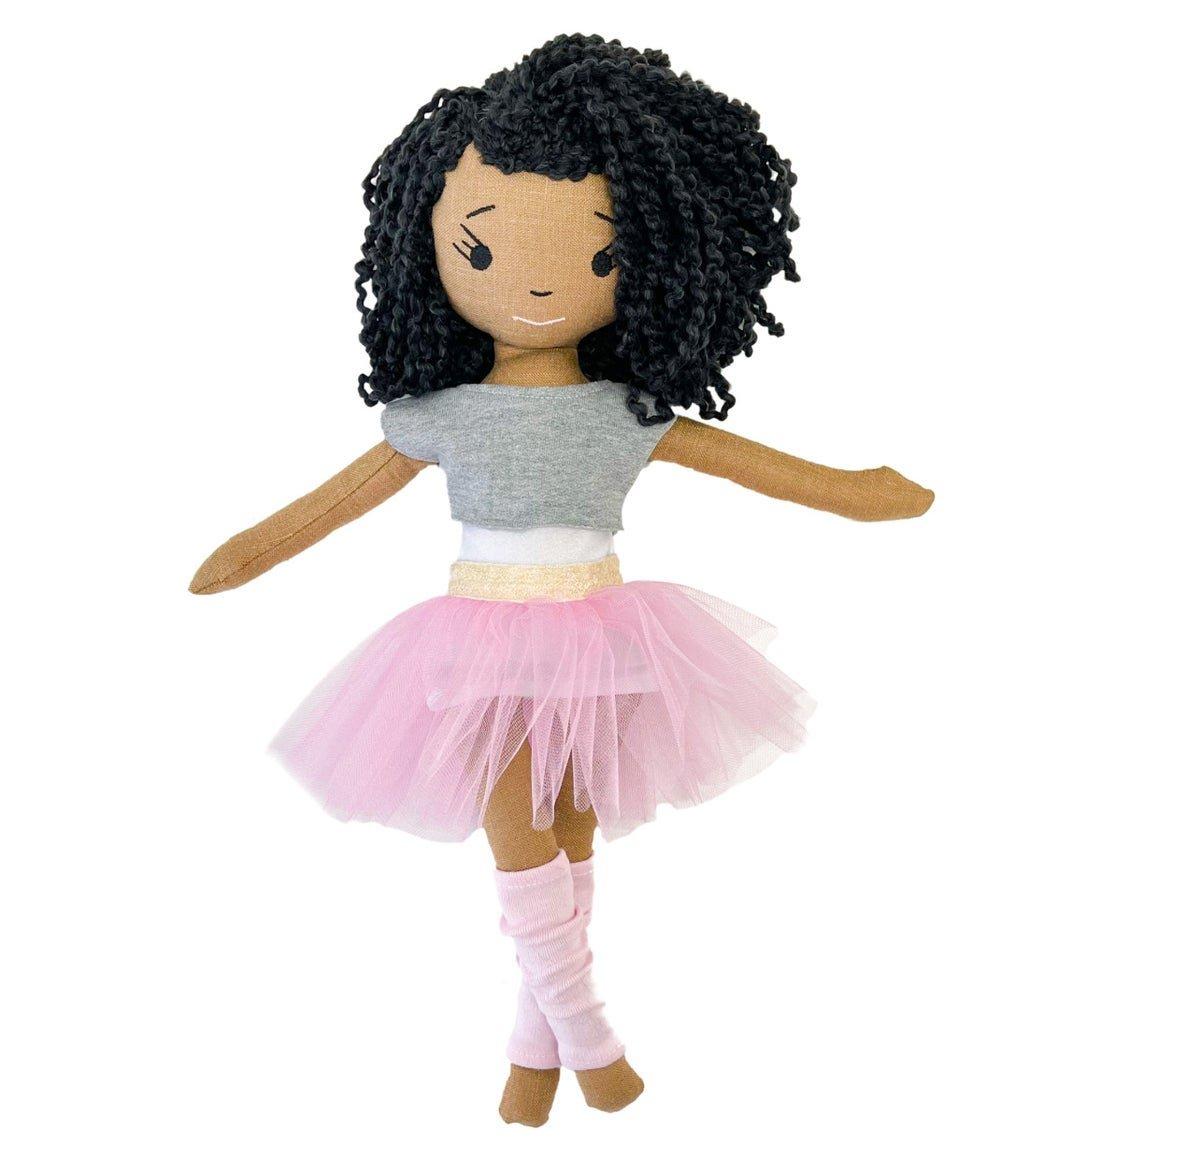 Brenn Handmade Linen Doll (Waitlist Preorder Item - ship date Oct 1-Mar 30,2022)